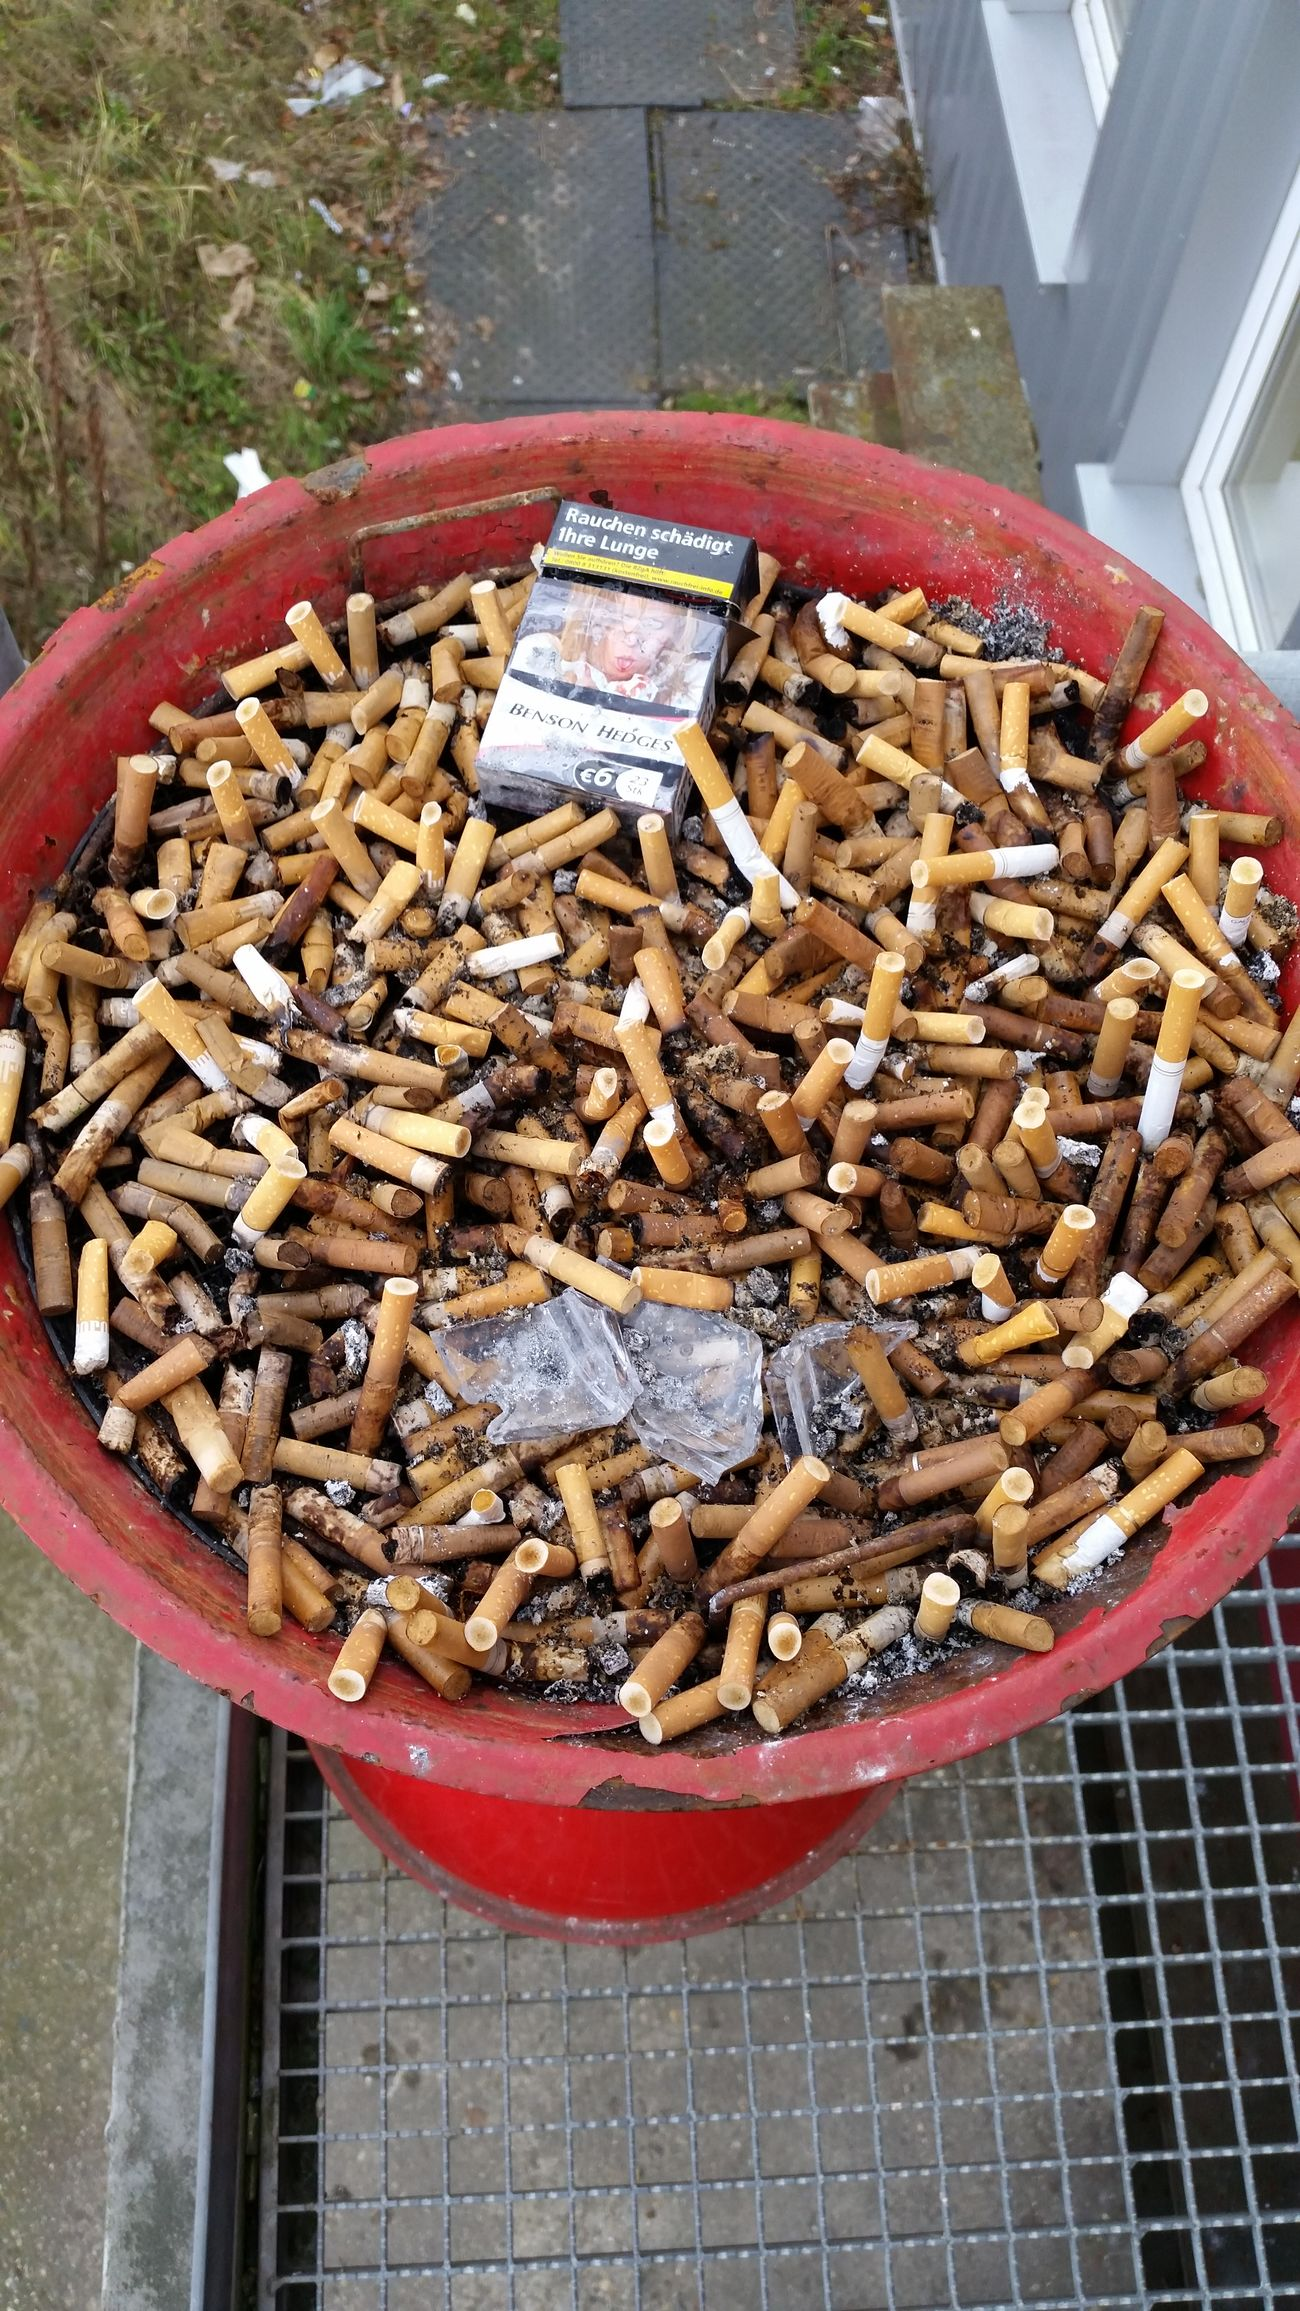 No smoke .... Aschenbecher Zigarettenstummel Pausenplatz Raucherecke Raucherzone Umweltverschmutzung